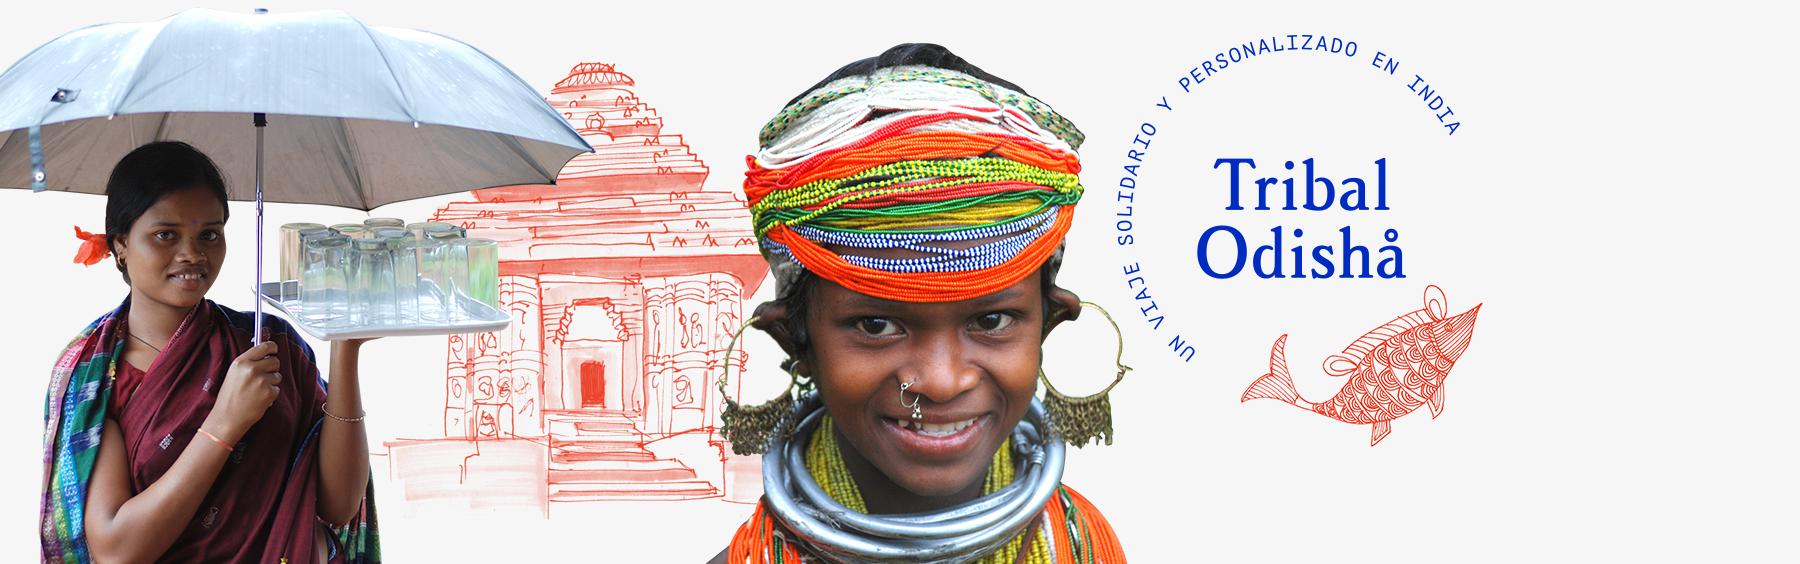 Tribal Odisha: Viajes a medida